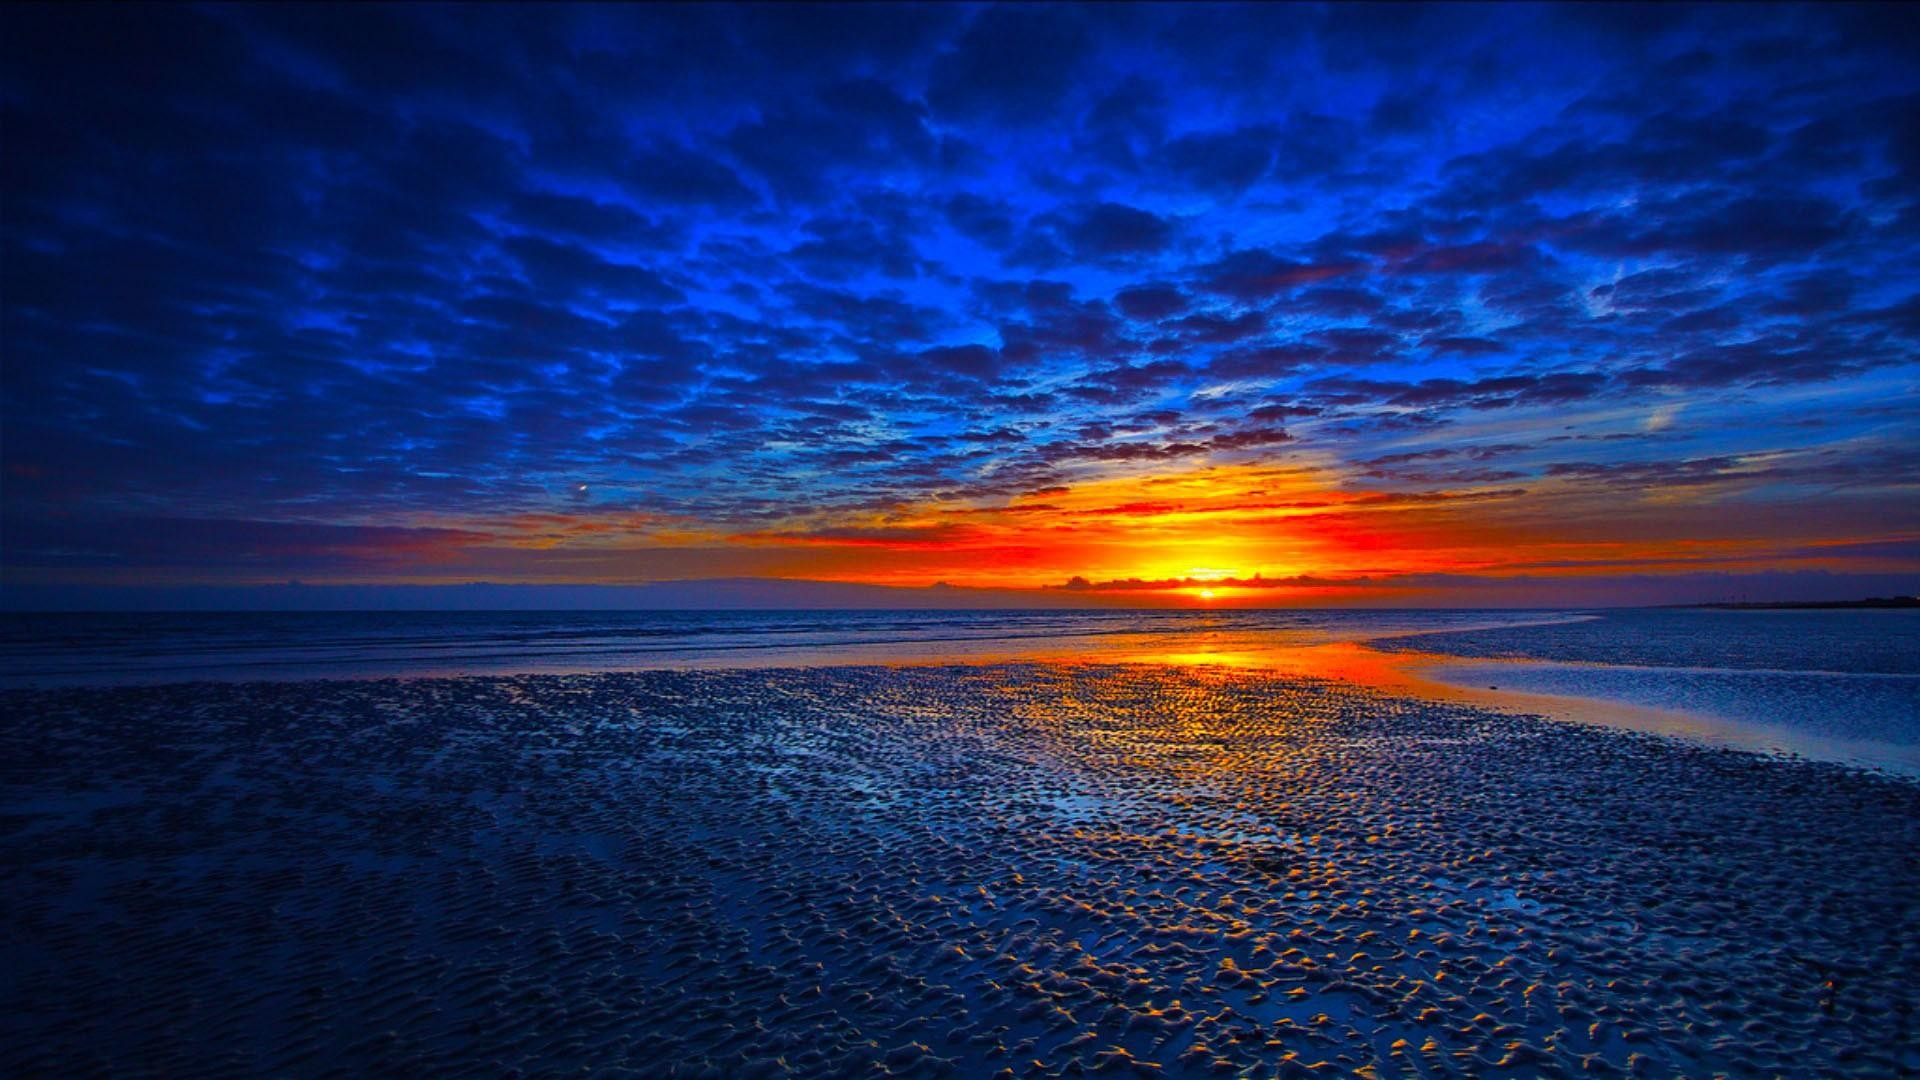 Beautiful Blue Sunset Landscape Wallpaper | Nature Pics Wallpaper .